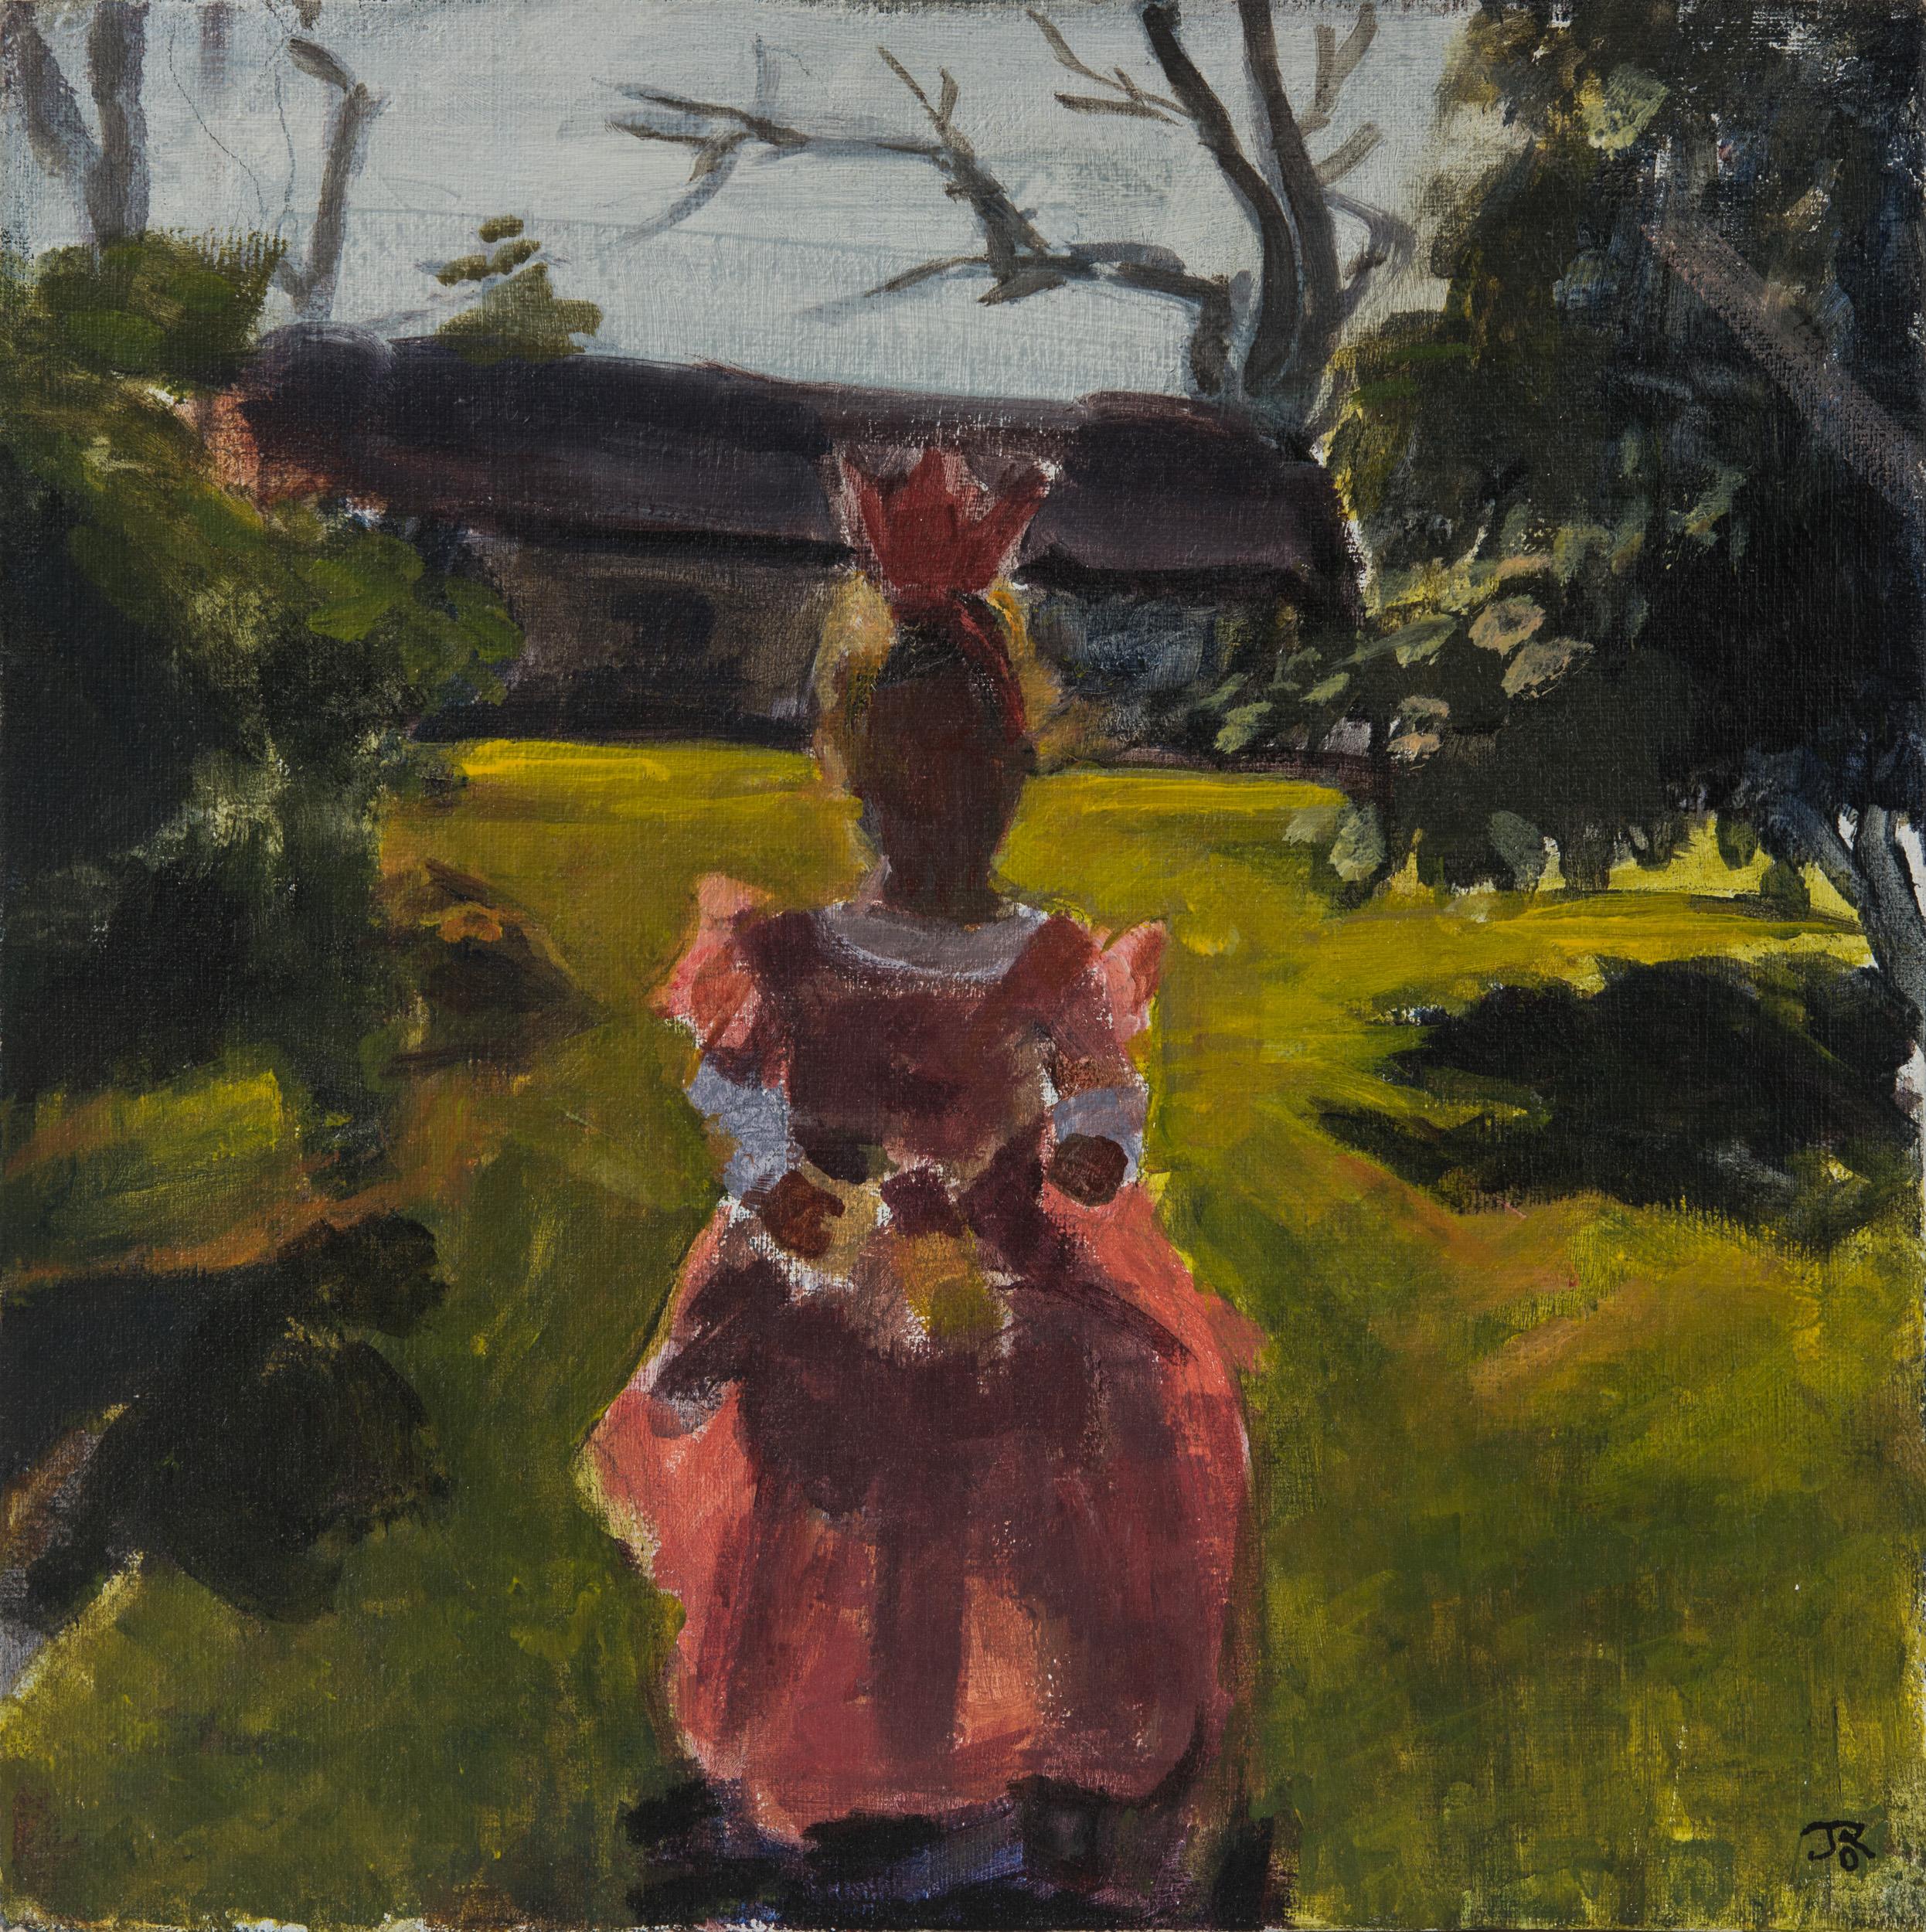 Pink  Dress on the Grass_2018